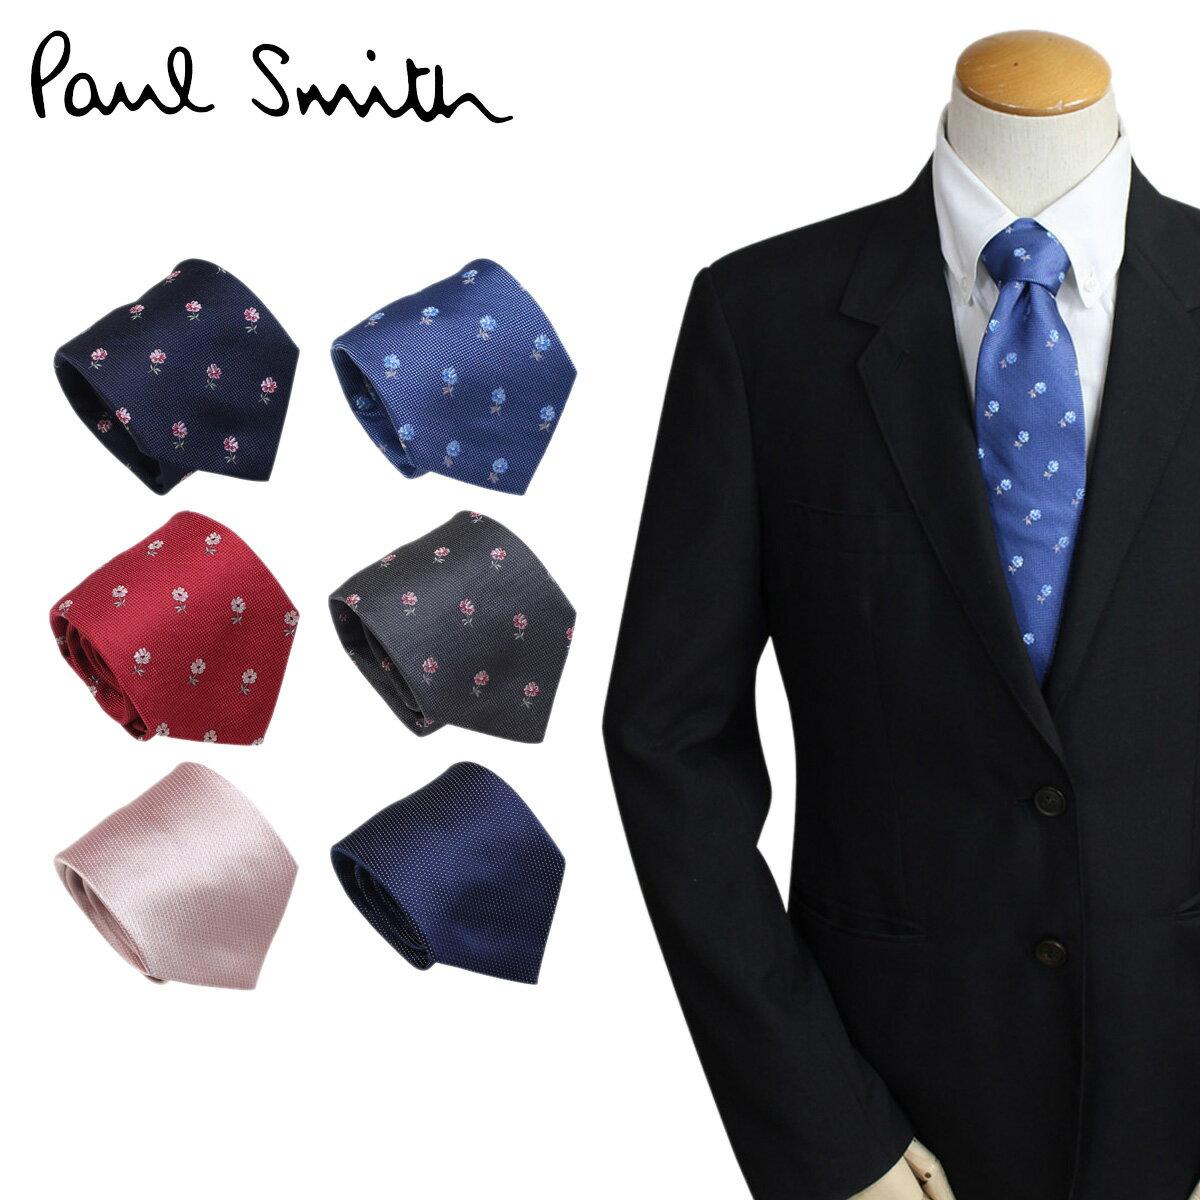 Paul Smith ネクタイ シルク メンズ ポールスミス ドット ギフト ケース付 イタリア製 ビジネス 結婚式 [8/7 追加入荷] [188] 【決算セール】